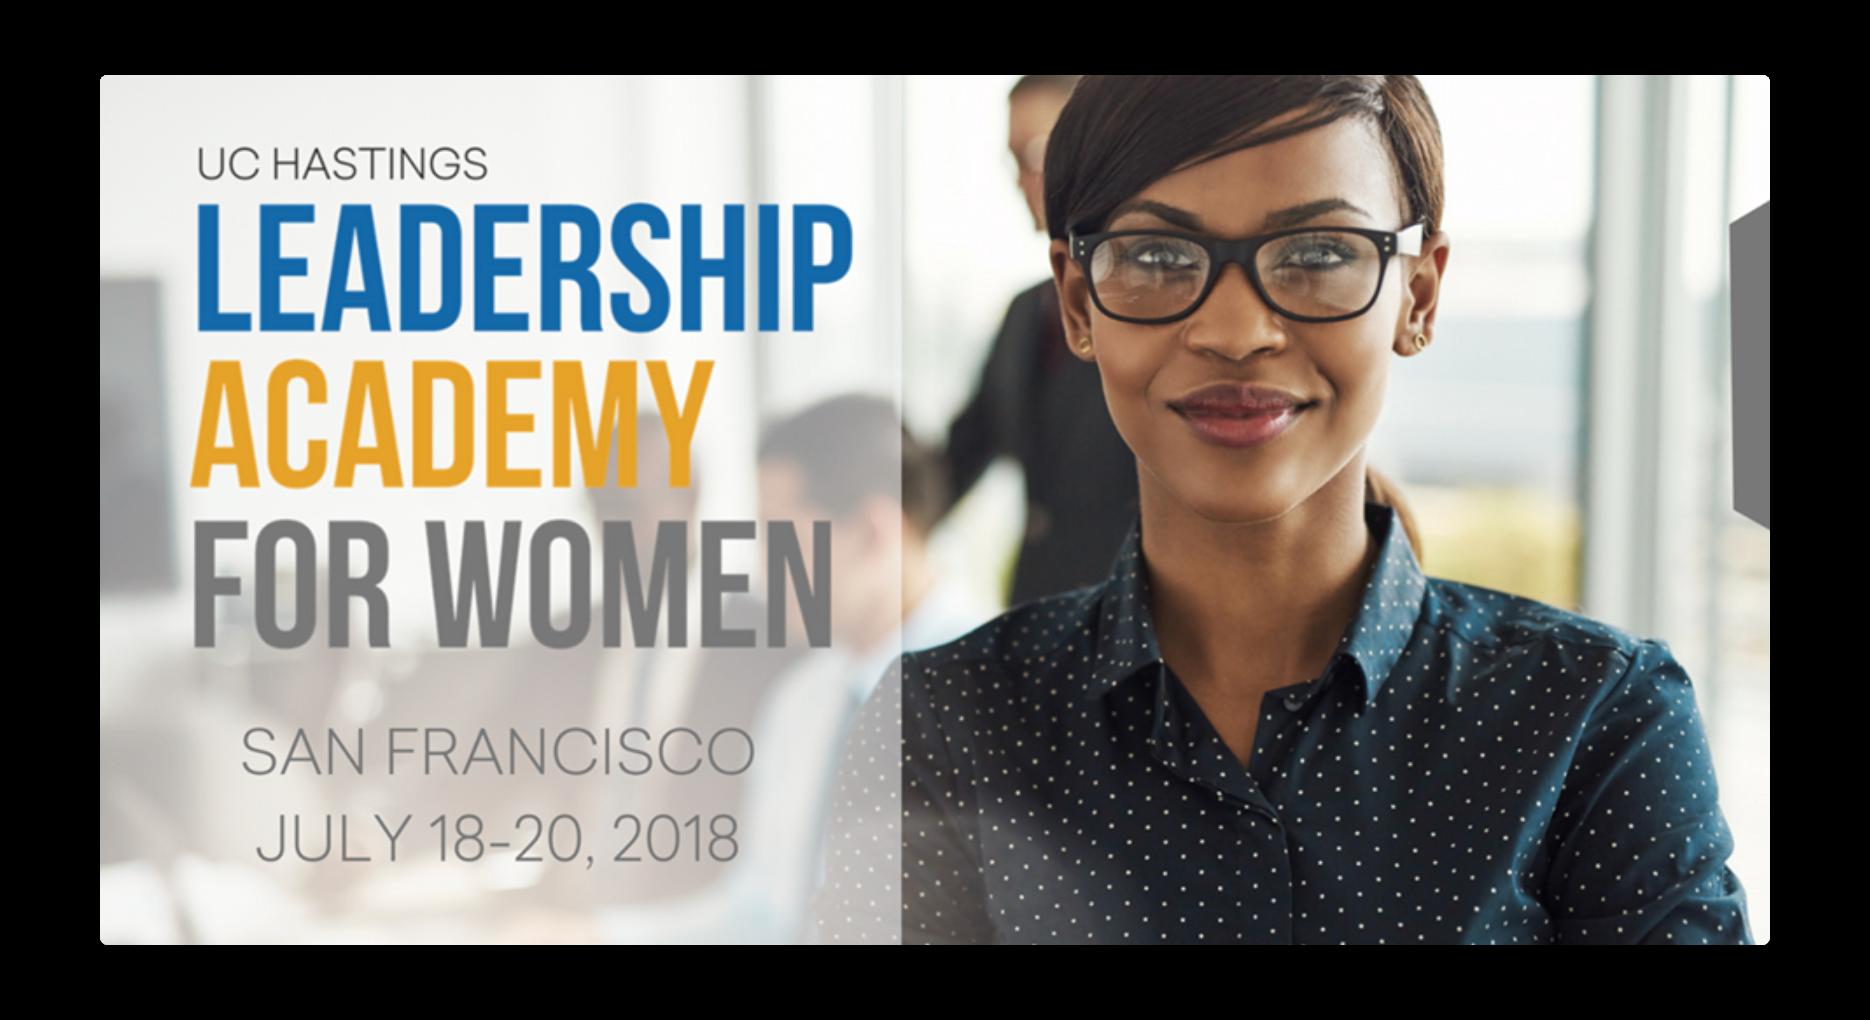 Diverge Women Leadership Academy